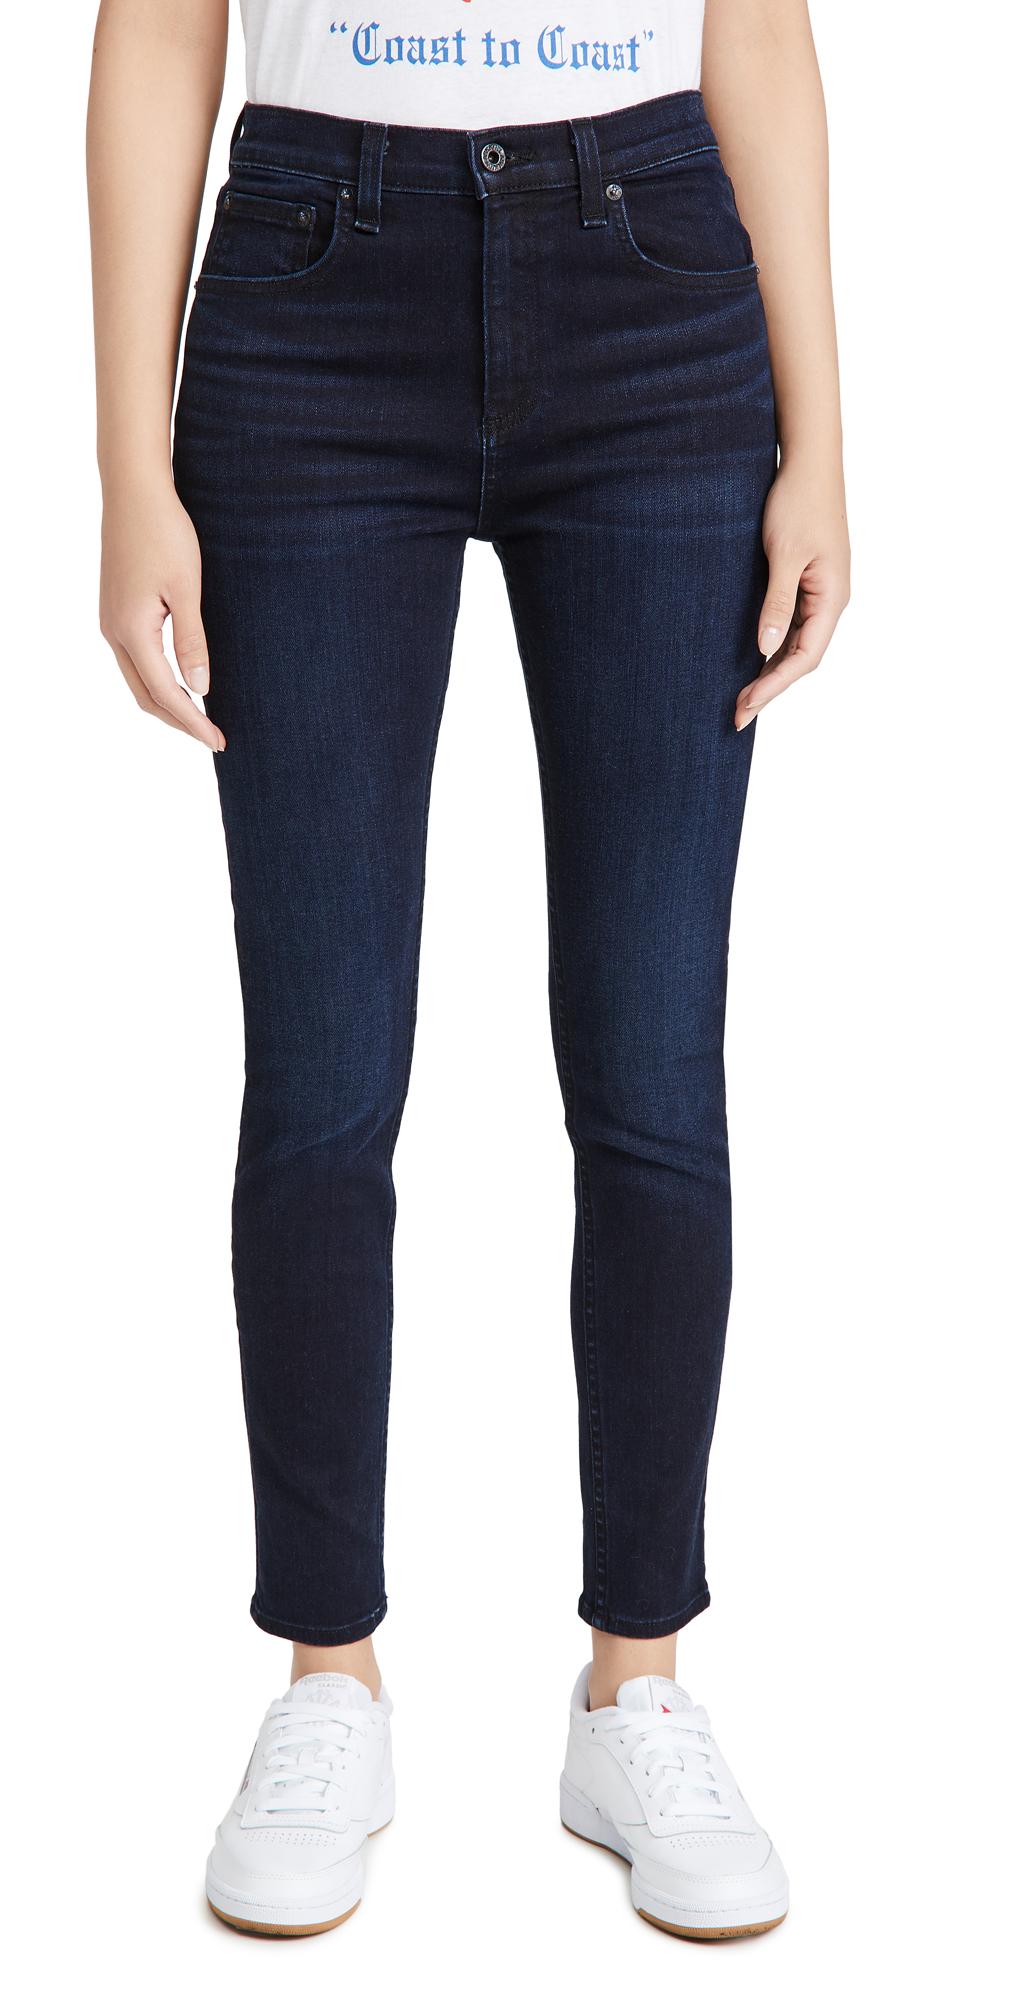 ASKK NY High Rise Skinny Jeans